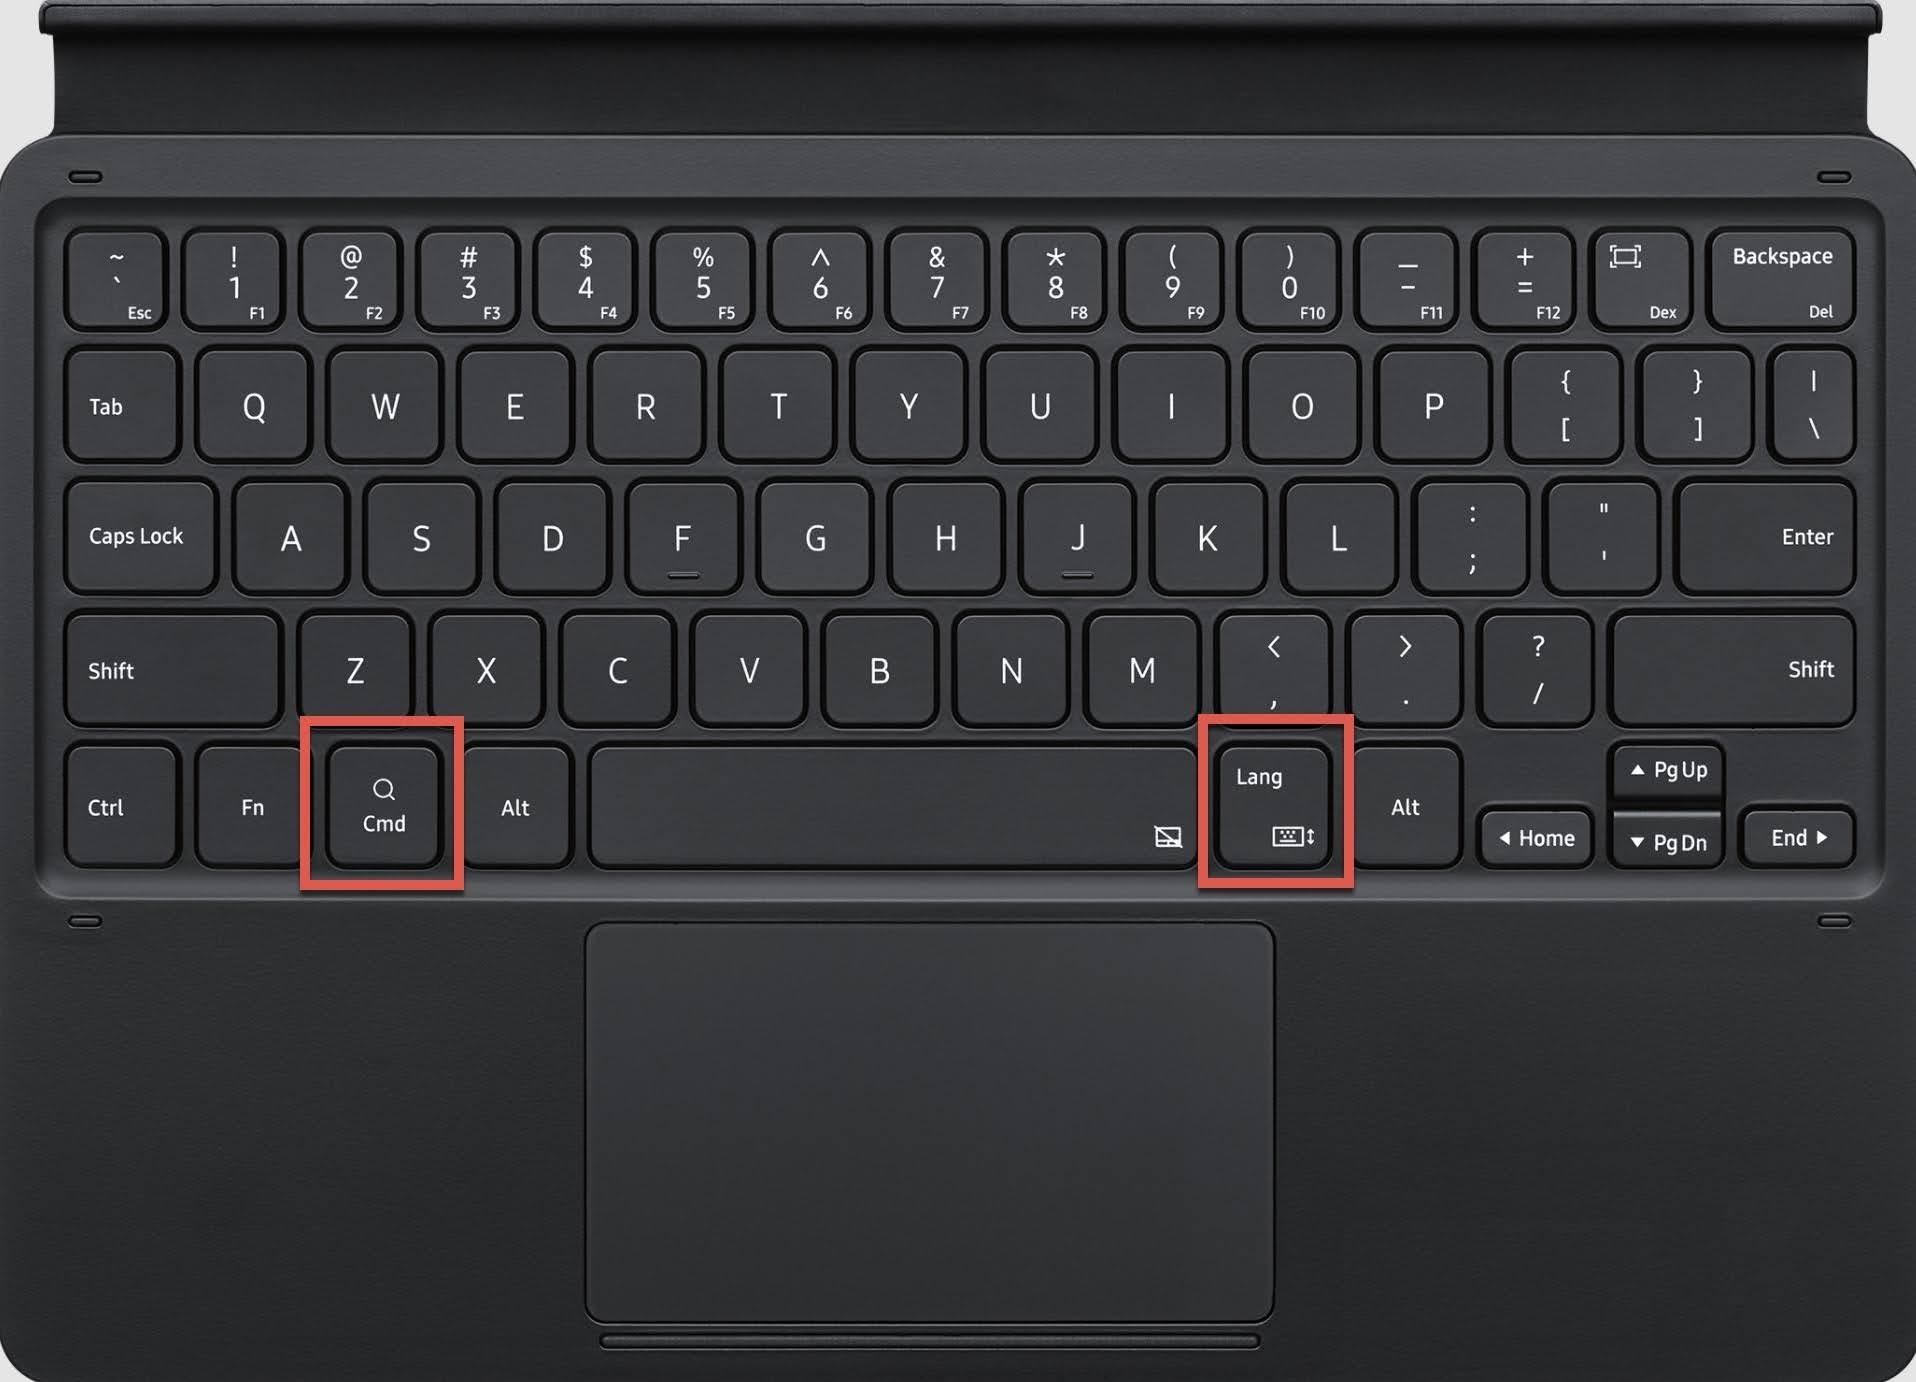 Press the cmd (command) + Lang (Language) keys together.